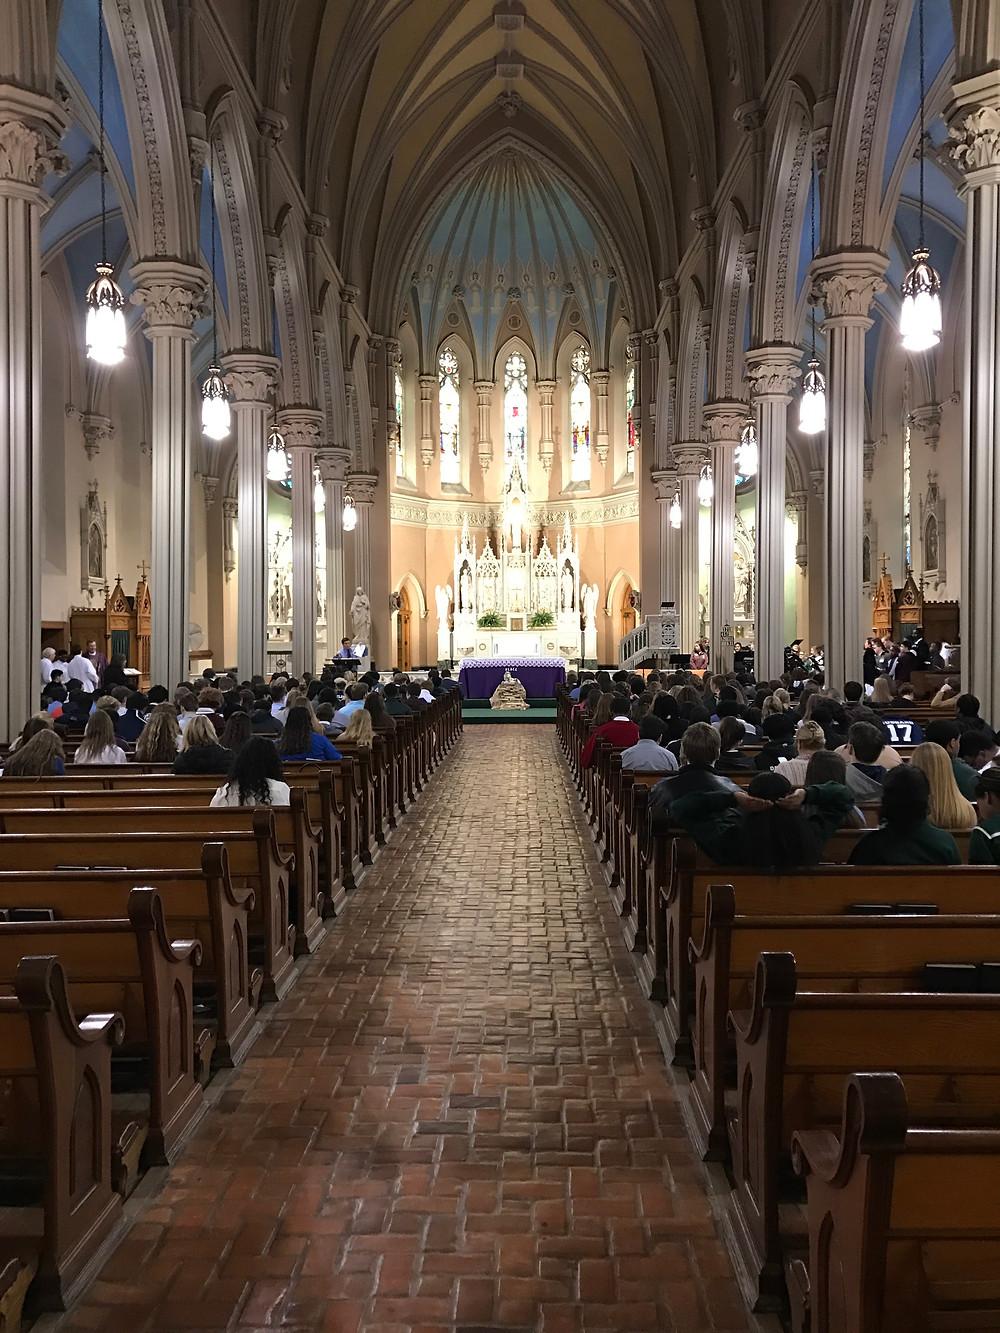 Mass at St. Patrick Church on Bridge Ave.